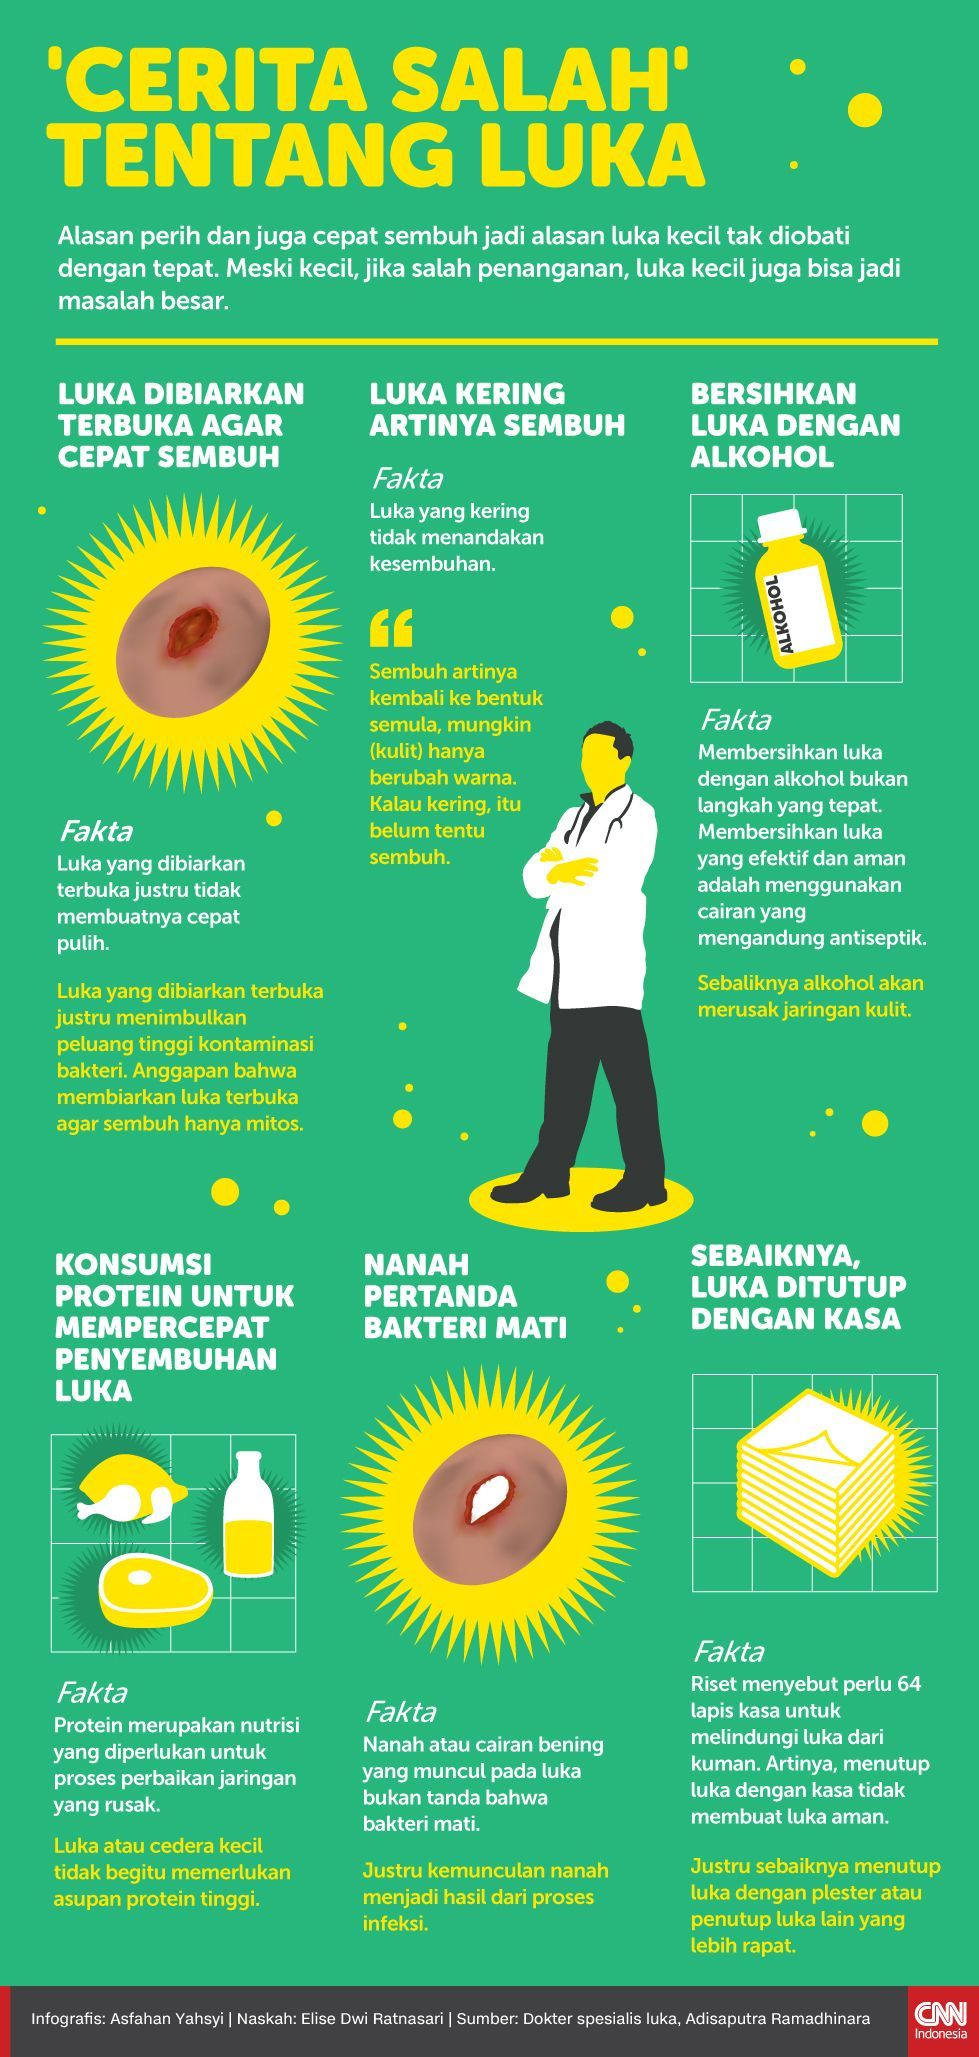 Infografis 'cerita salah' Tentang Luka